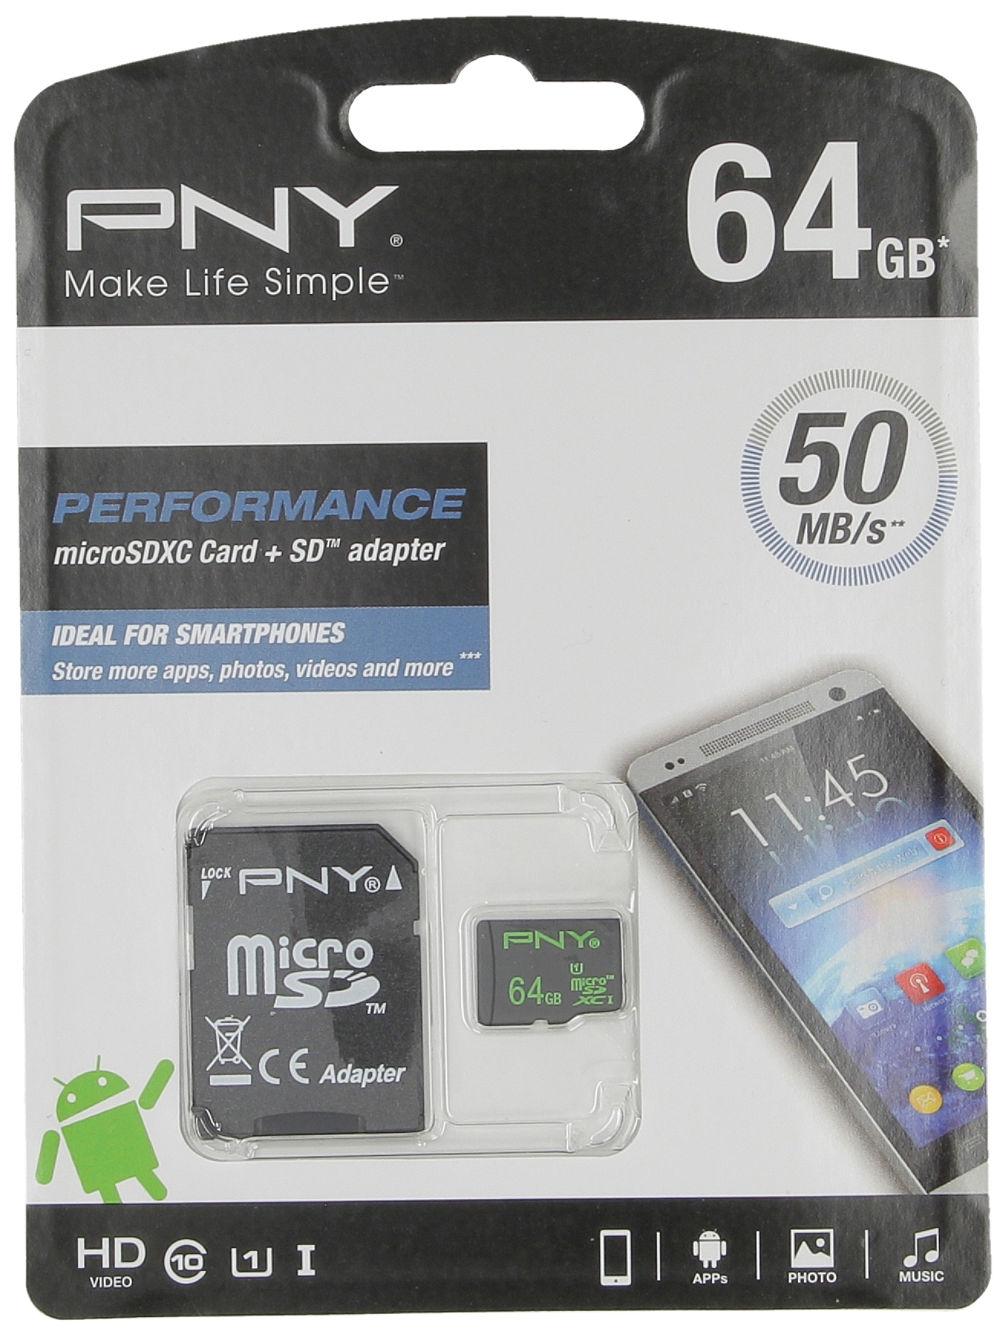 pny-64gb-micro-sd-performance-50mbs